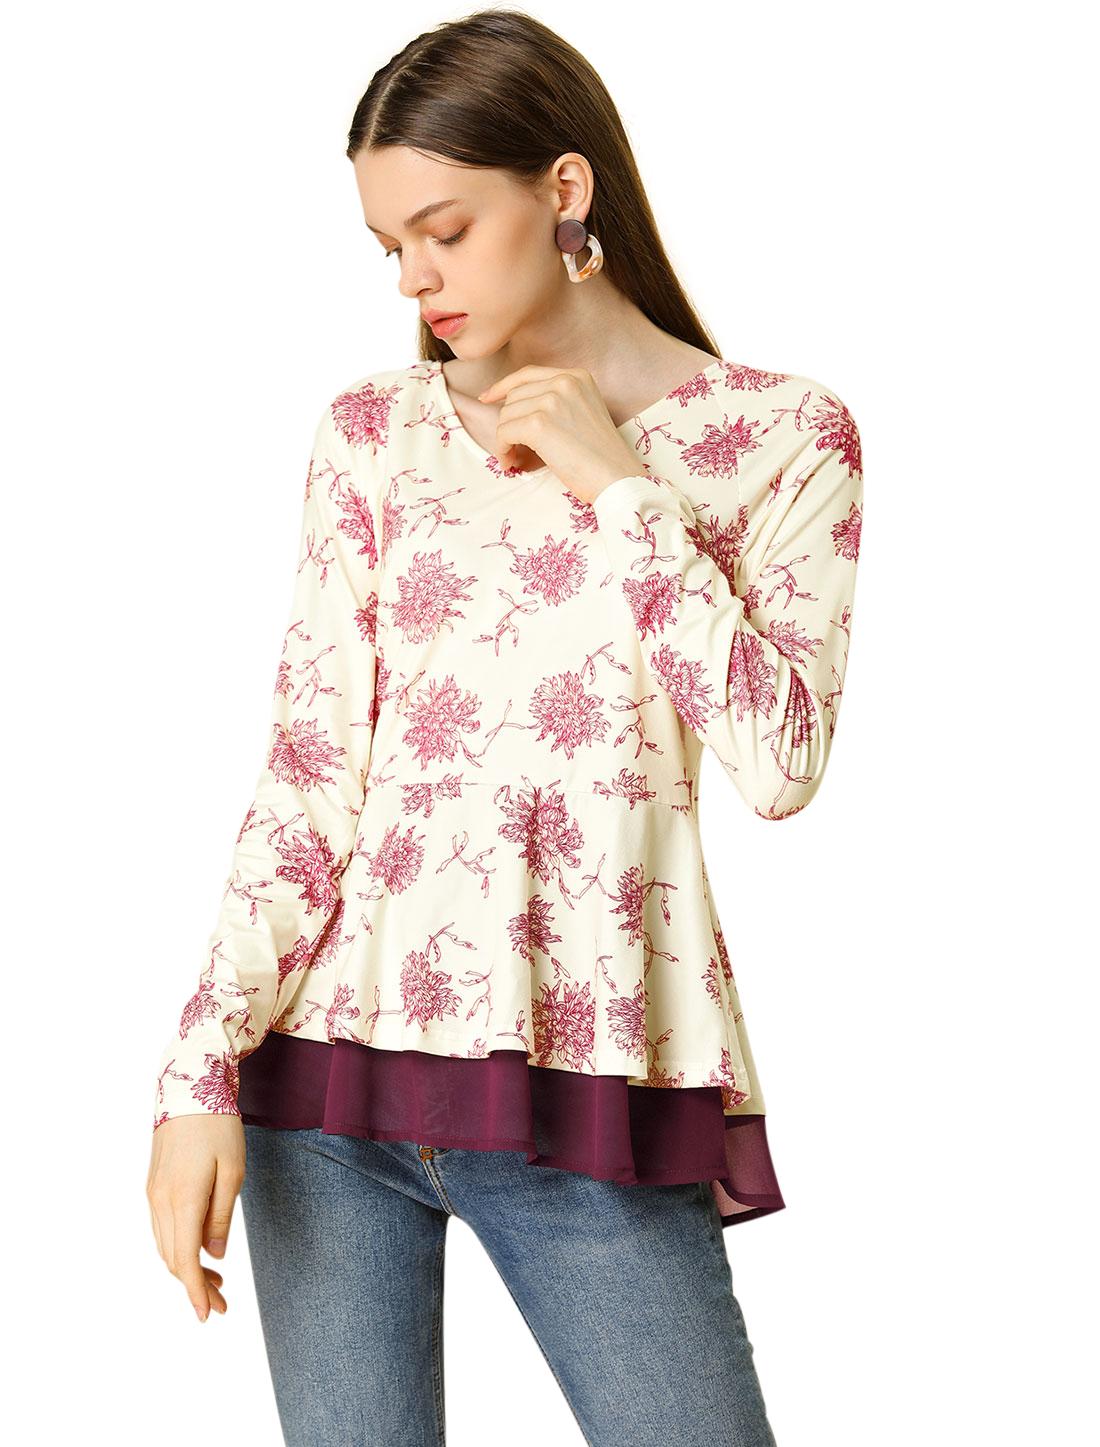 Allegra K Women's Floral V Neck Raglan Sleeve Ruffles Hem Top Beige XS